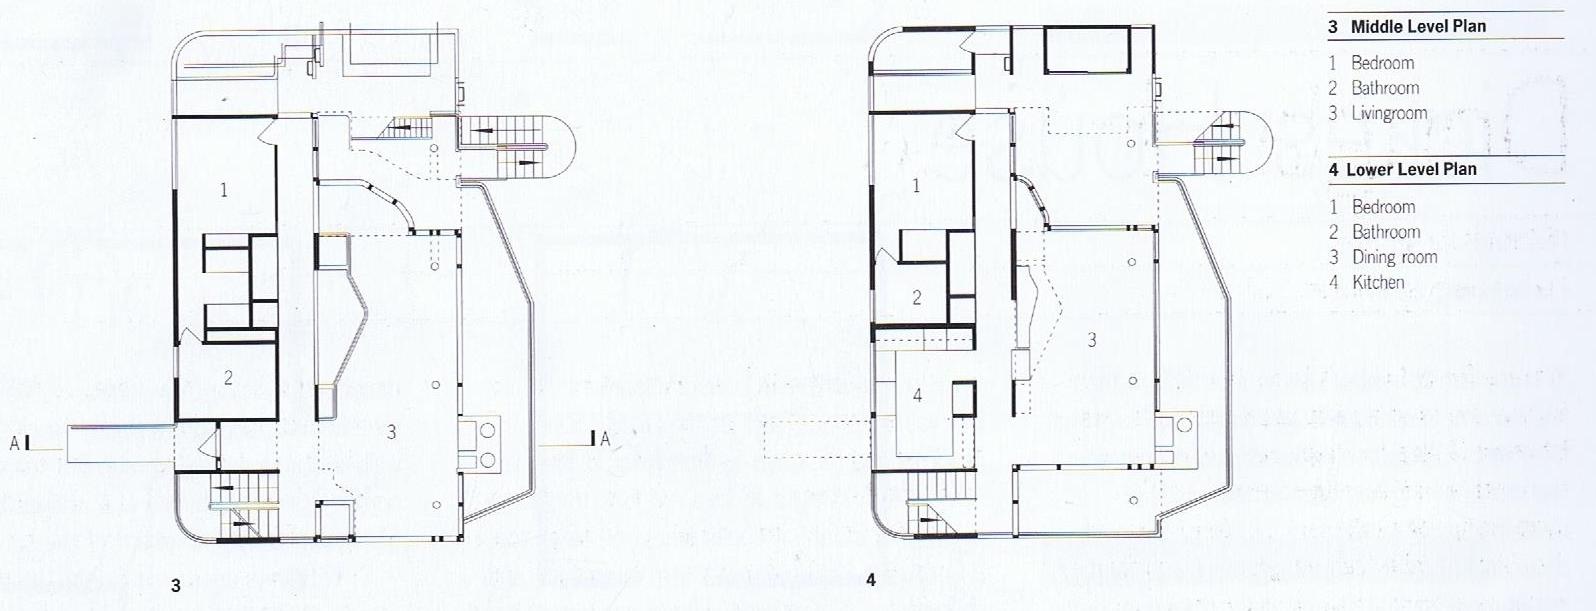 Layoutf further T2 05 5sal Plan   1 1 additionally Eco House Plans furthermore 54877eaee58ecec7950001a7 Ground Floor Plan also Disneys Boardwalk Villas. on villa floor plans